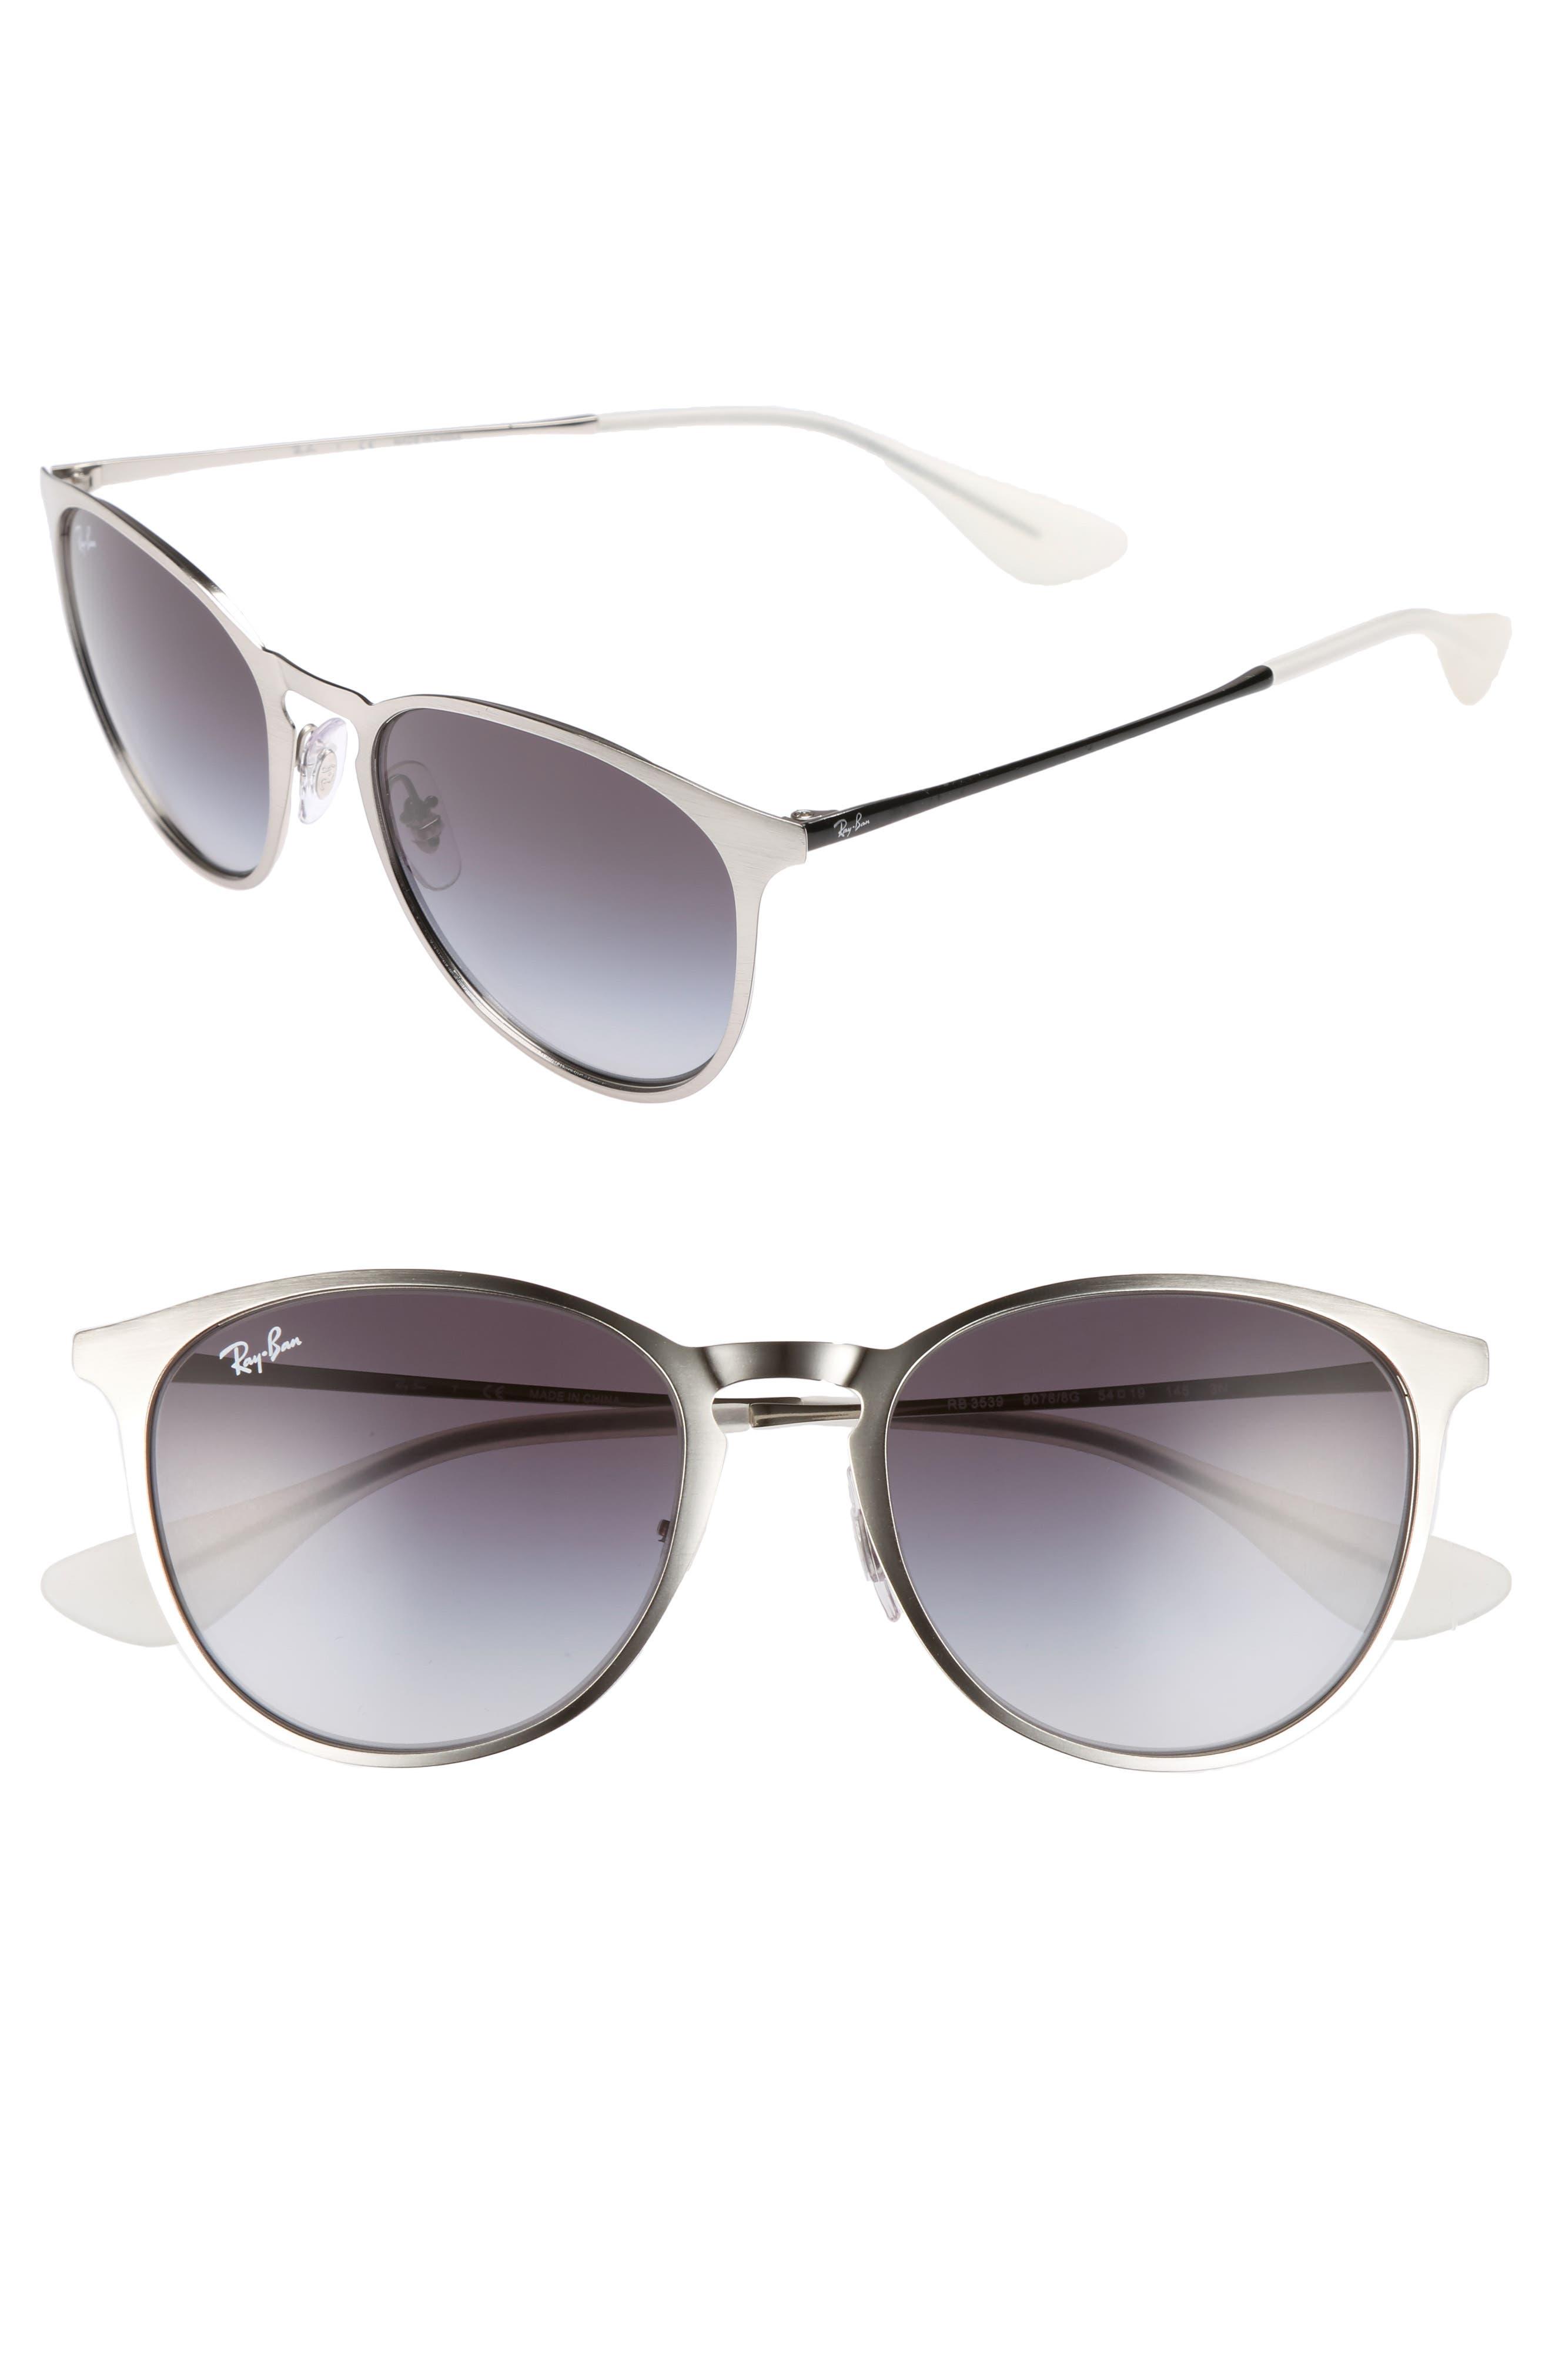 Ray-Ban Erika 5m Metal Sunglasses - Lite Silver